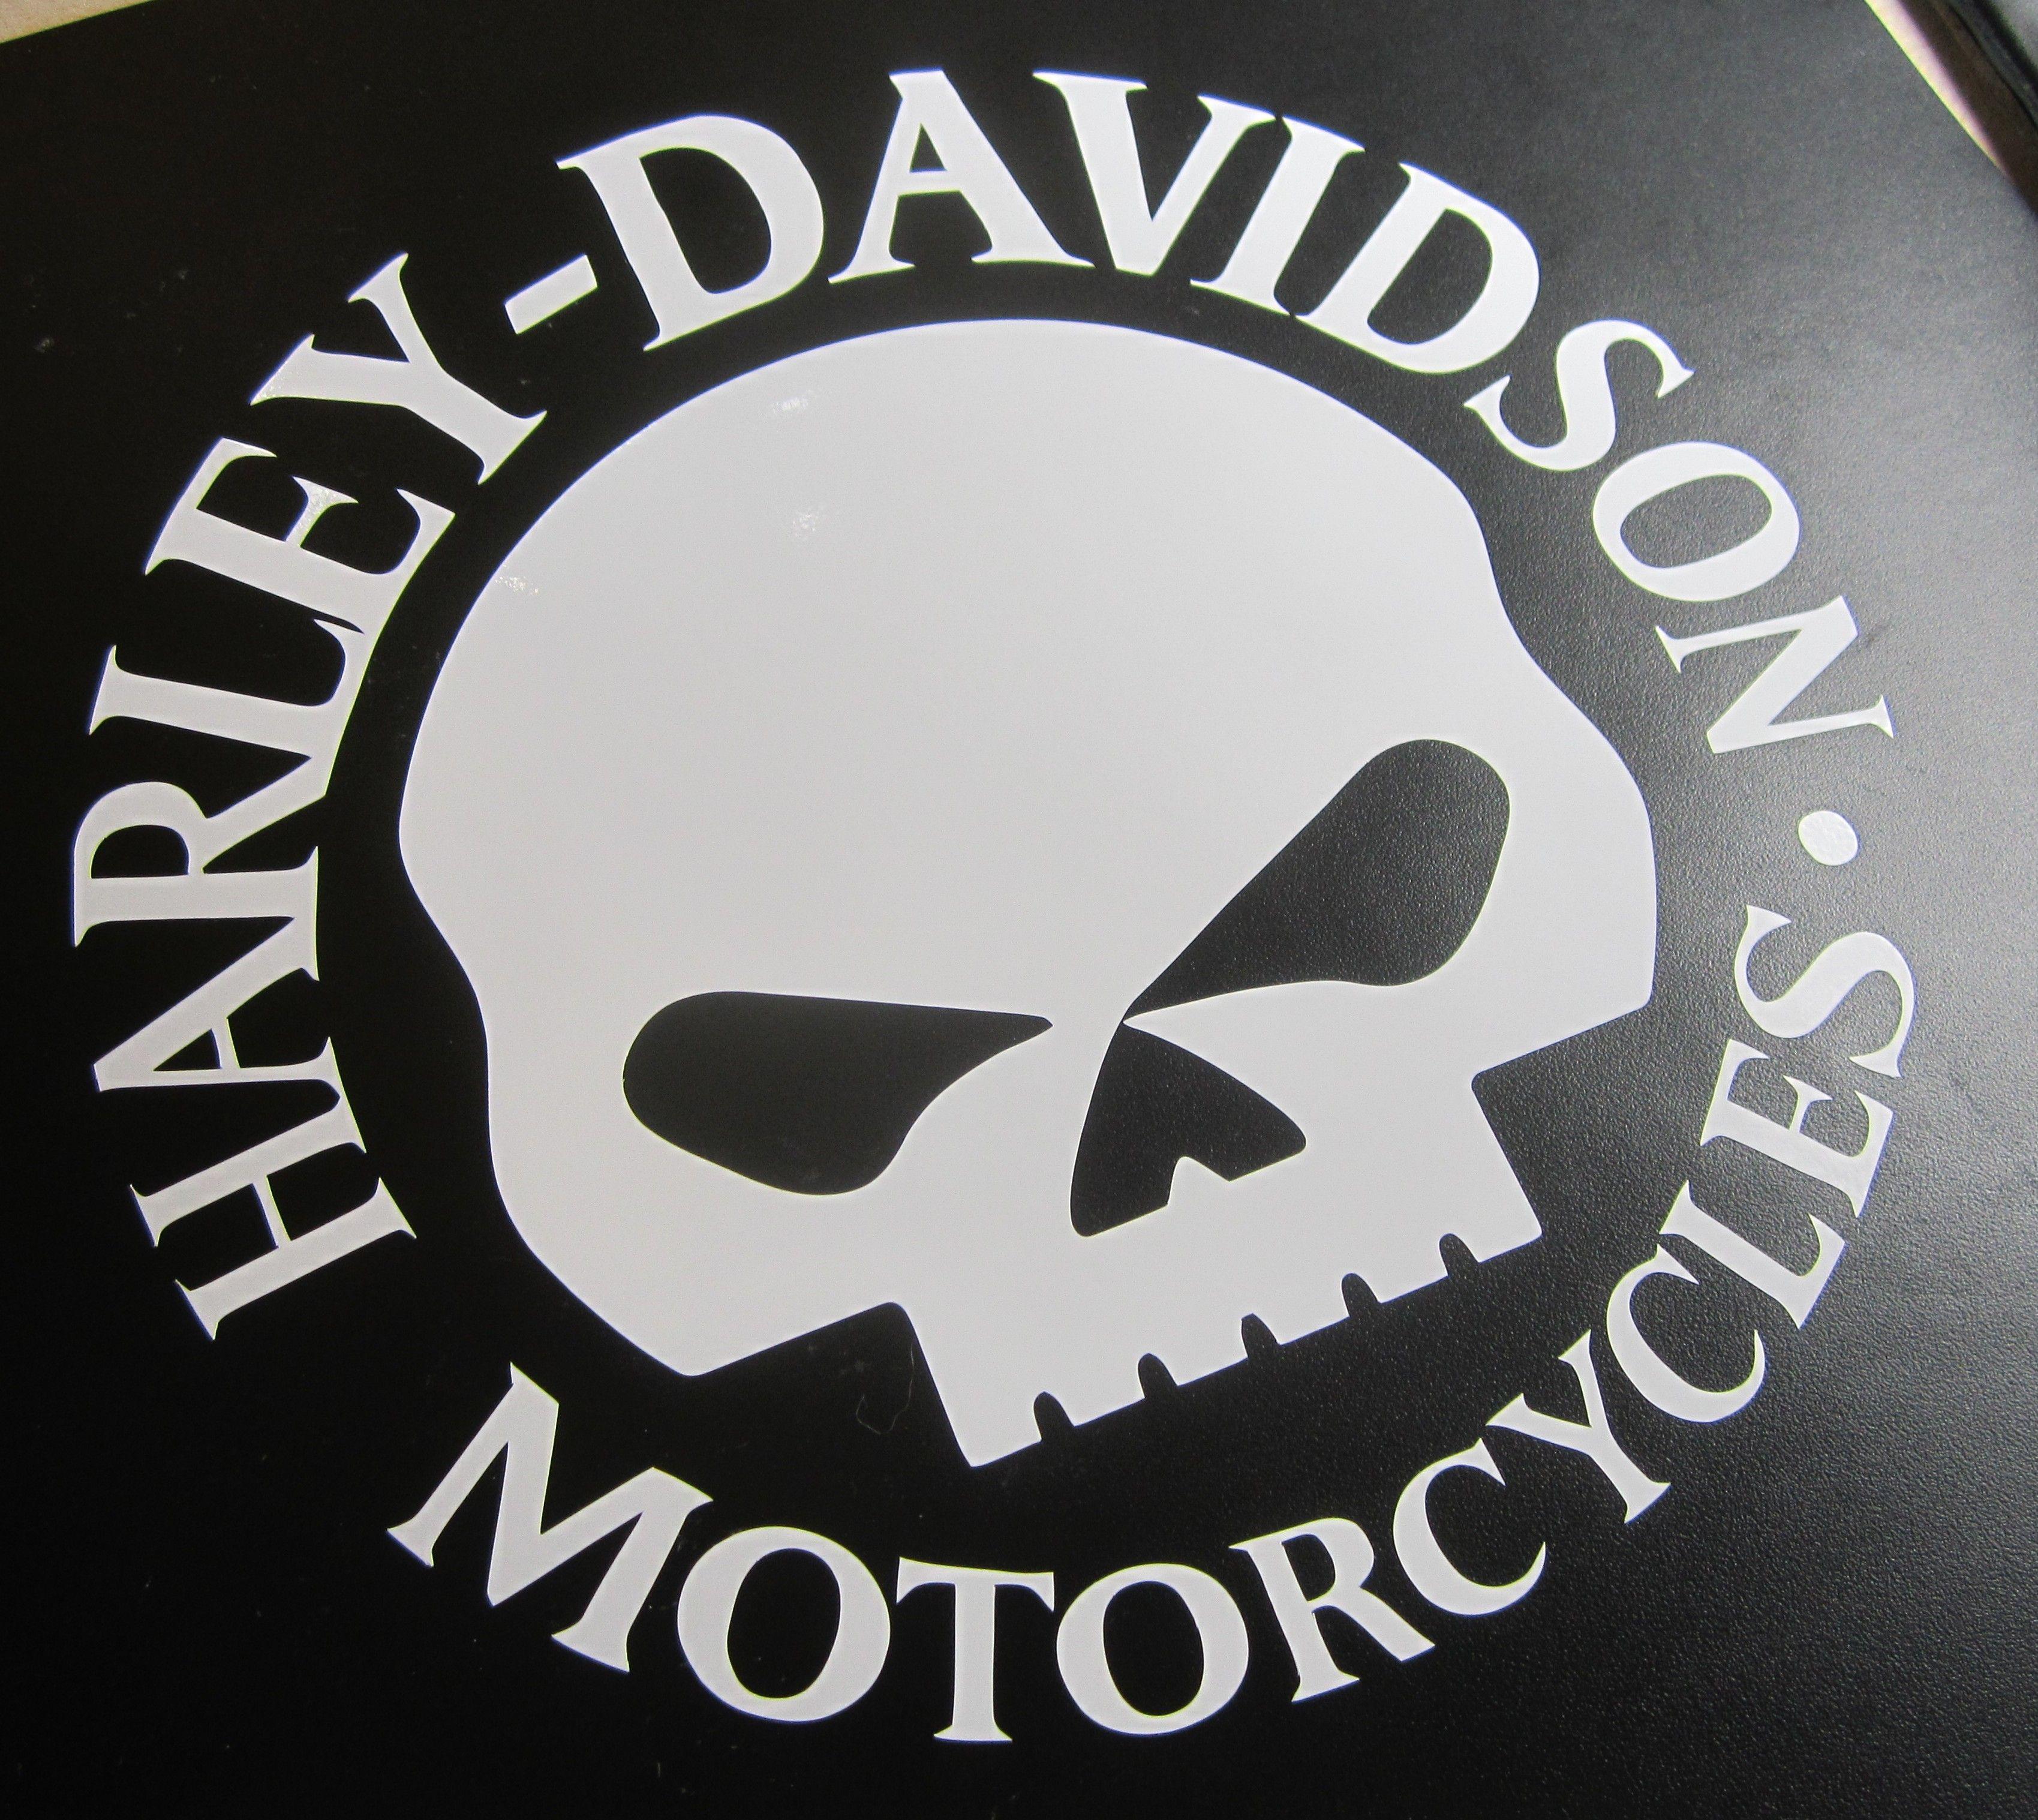 Harley Davidson Decal Biker Sticker Hd Skull Harley Davidson Decals Harley Harley Davidson [ 3034 x 3398 Pixel ]